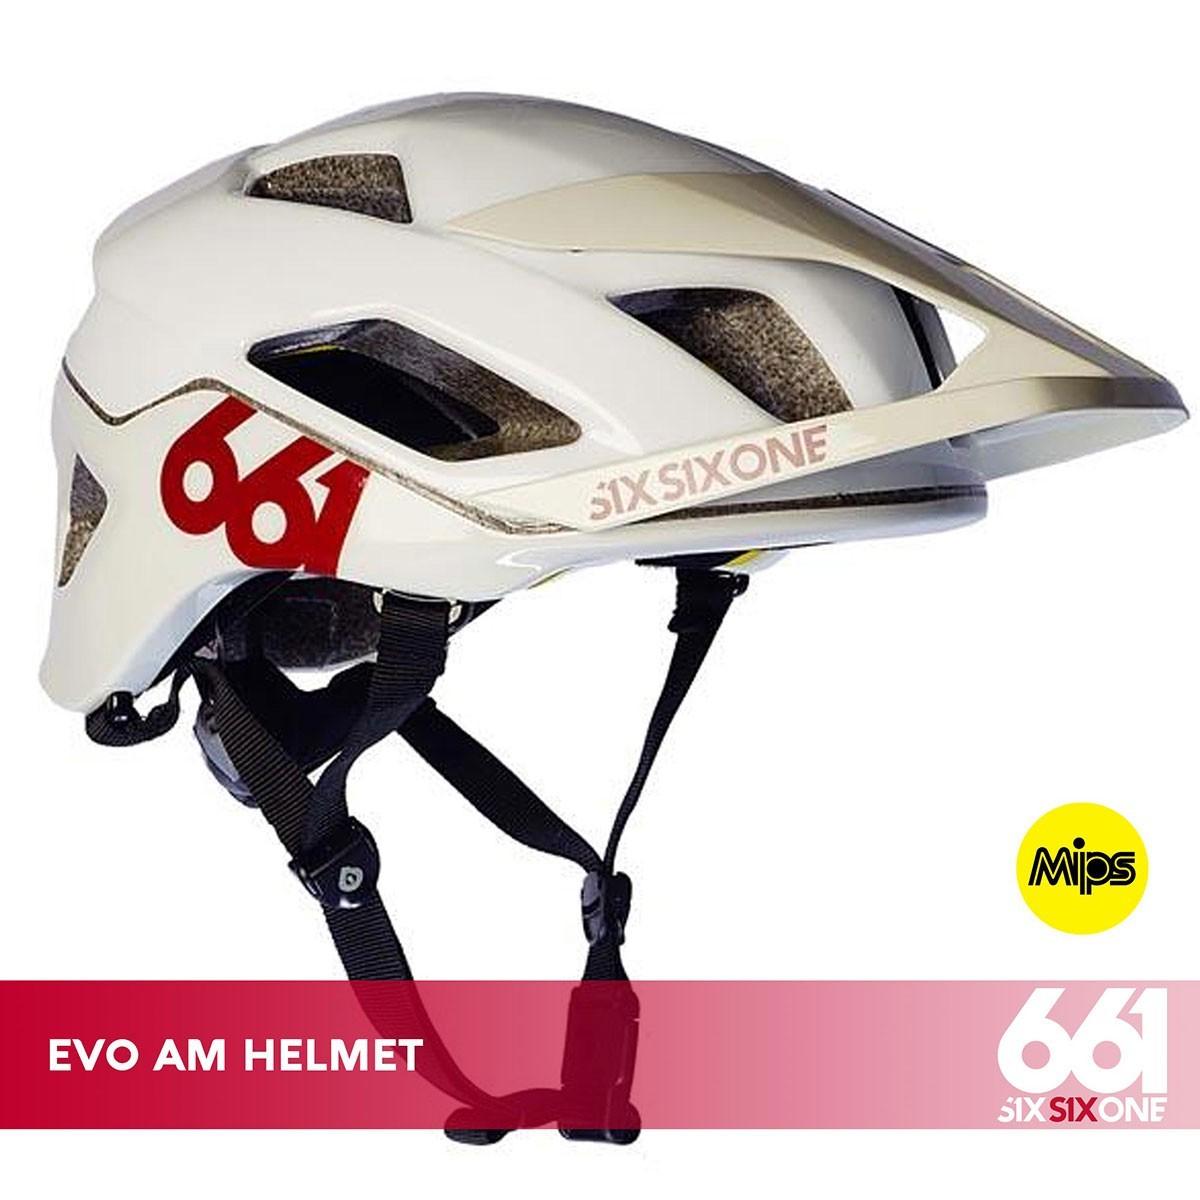 661 EVO AM MIPS CE TUNDRA WHITE - Изображение - AQUAMATRIX